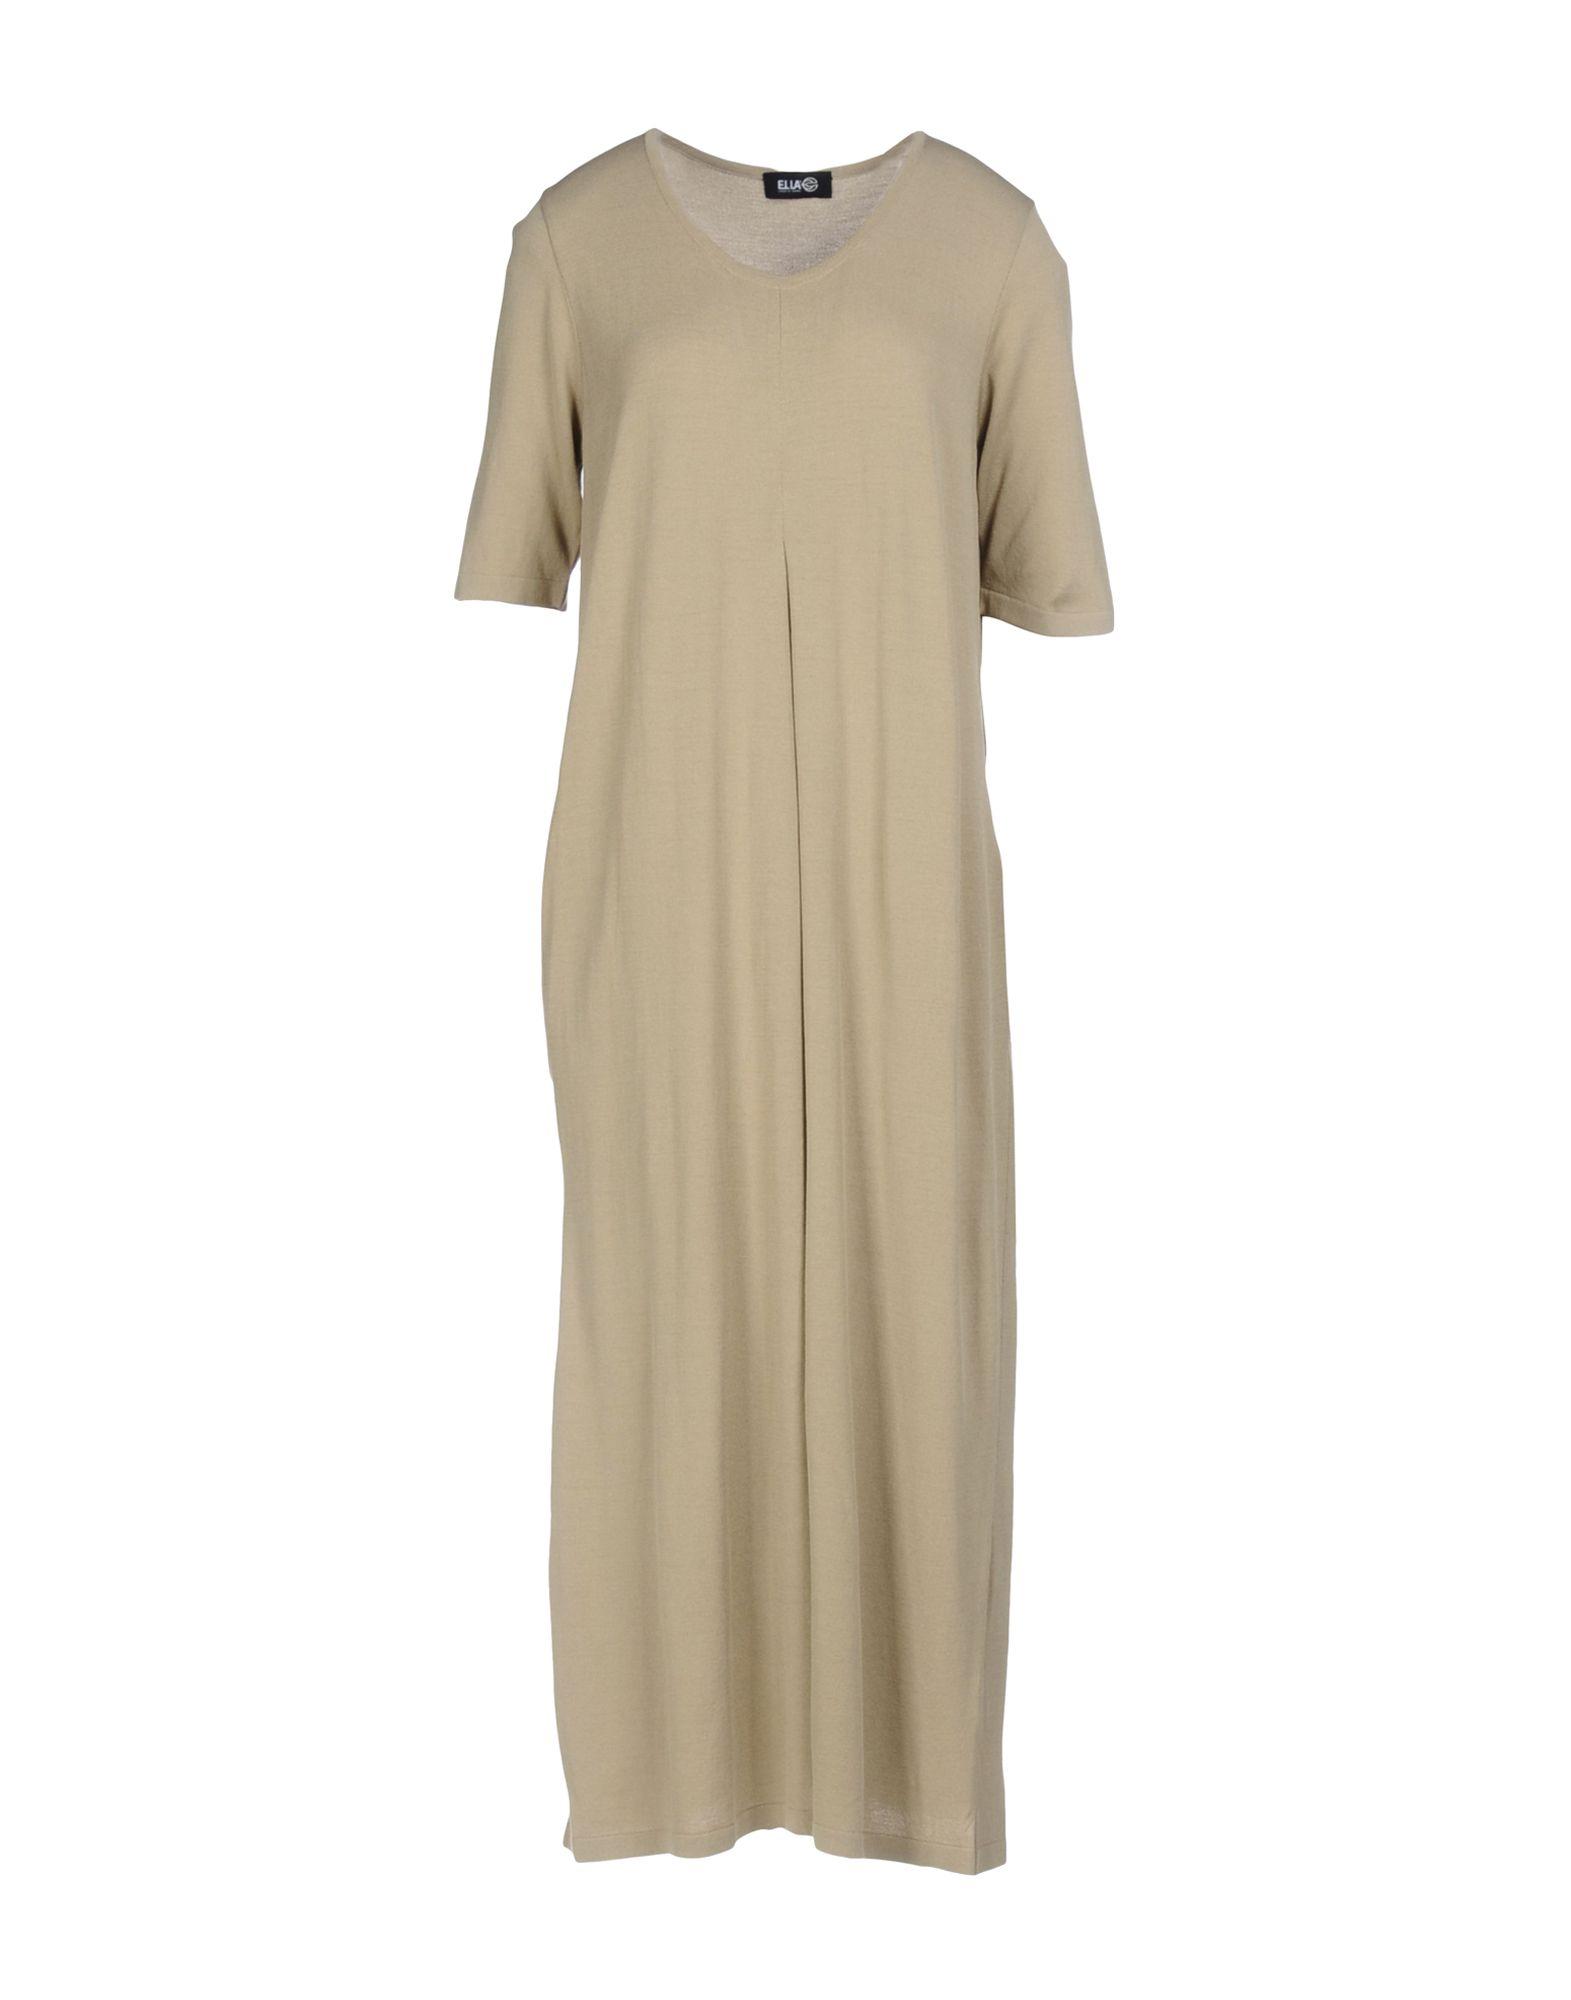 EL LA Damen Knielanges Kleid Farbe Beige Größe 6